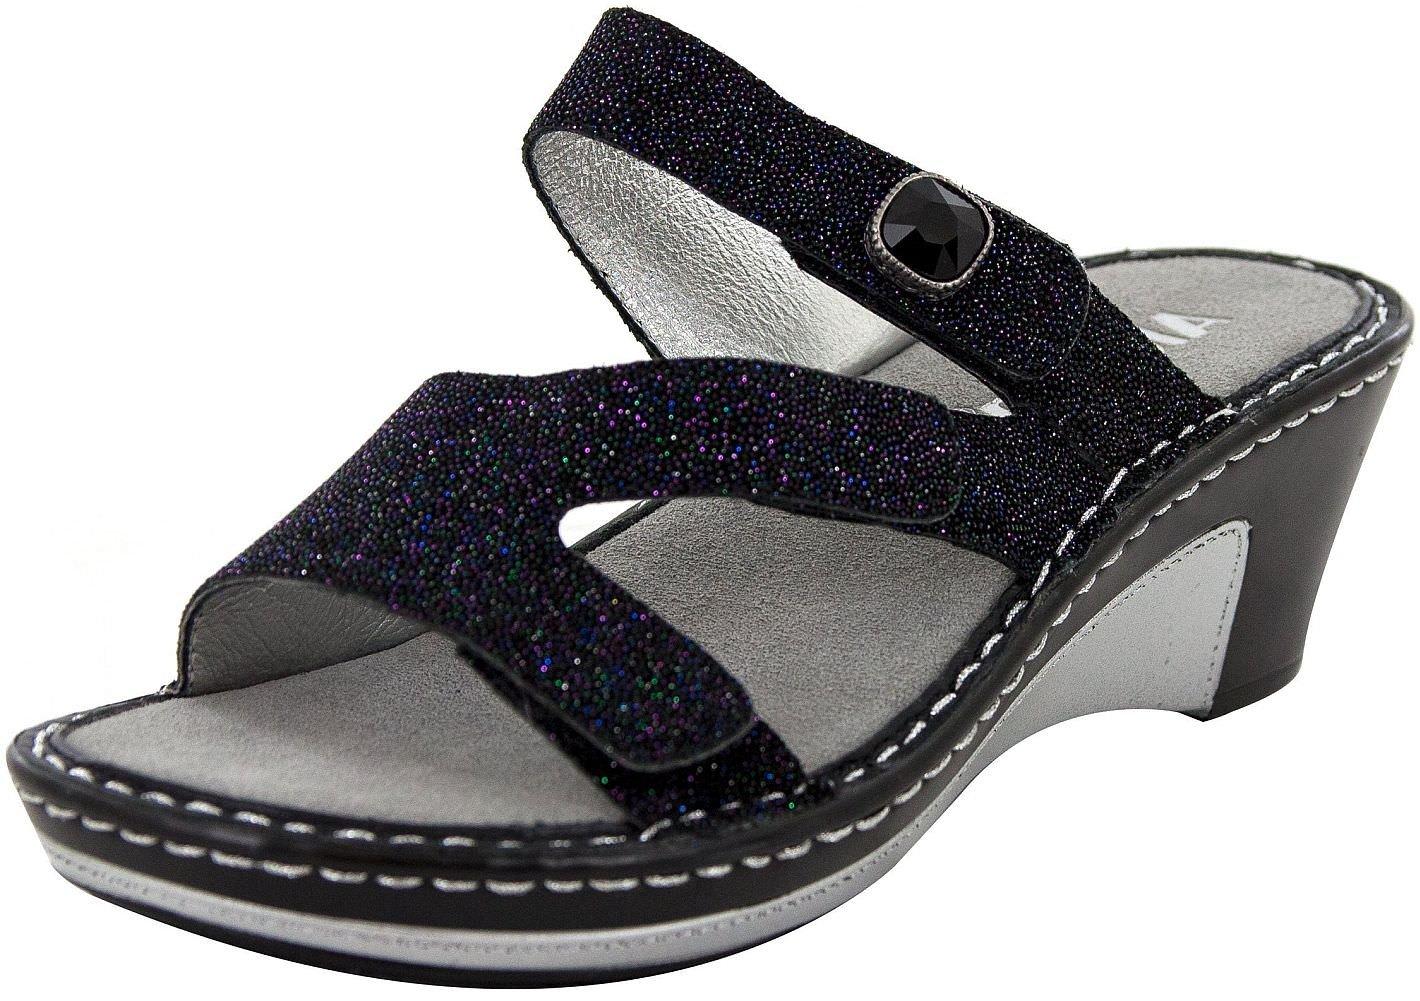 Alegria Womens Open Toe Casual Platform Sandals B079558NP2 4 B(M) US|Tectonic Tectonic 4 B(M) US